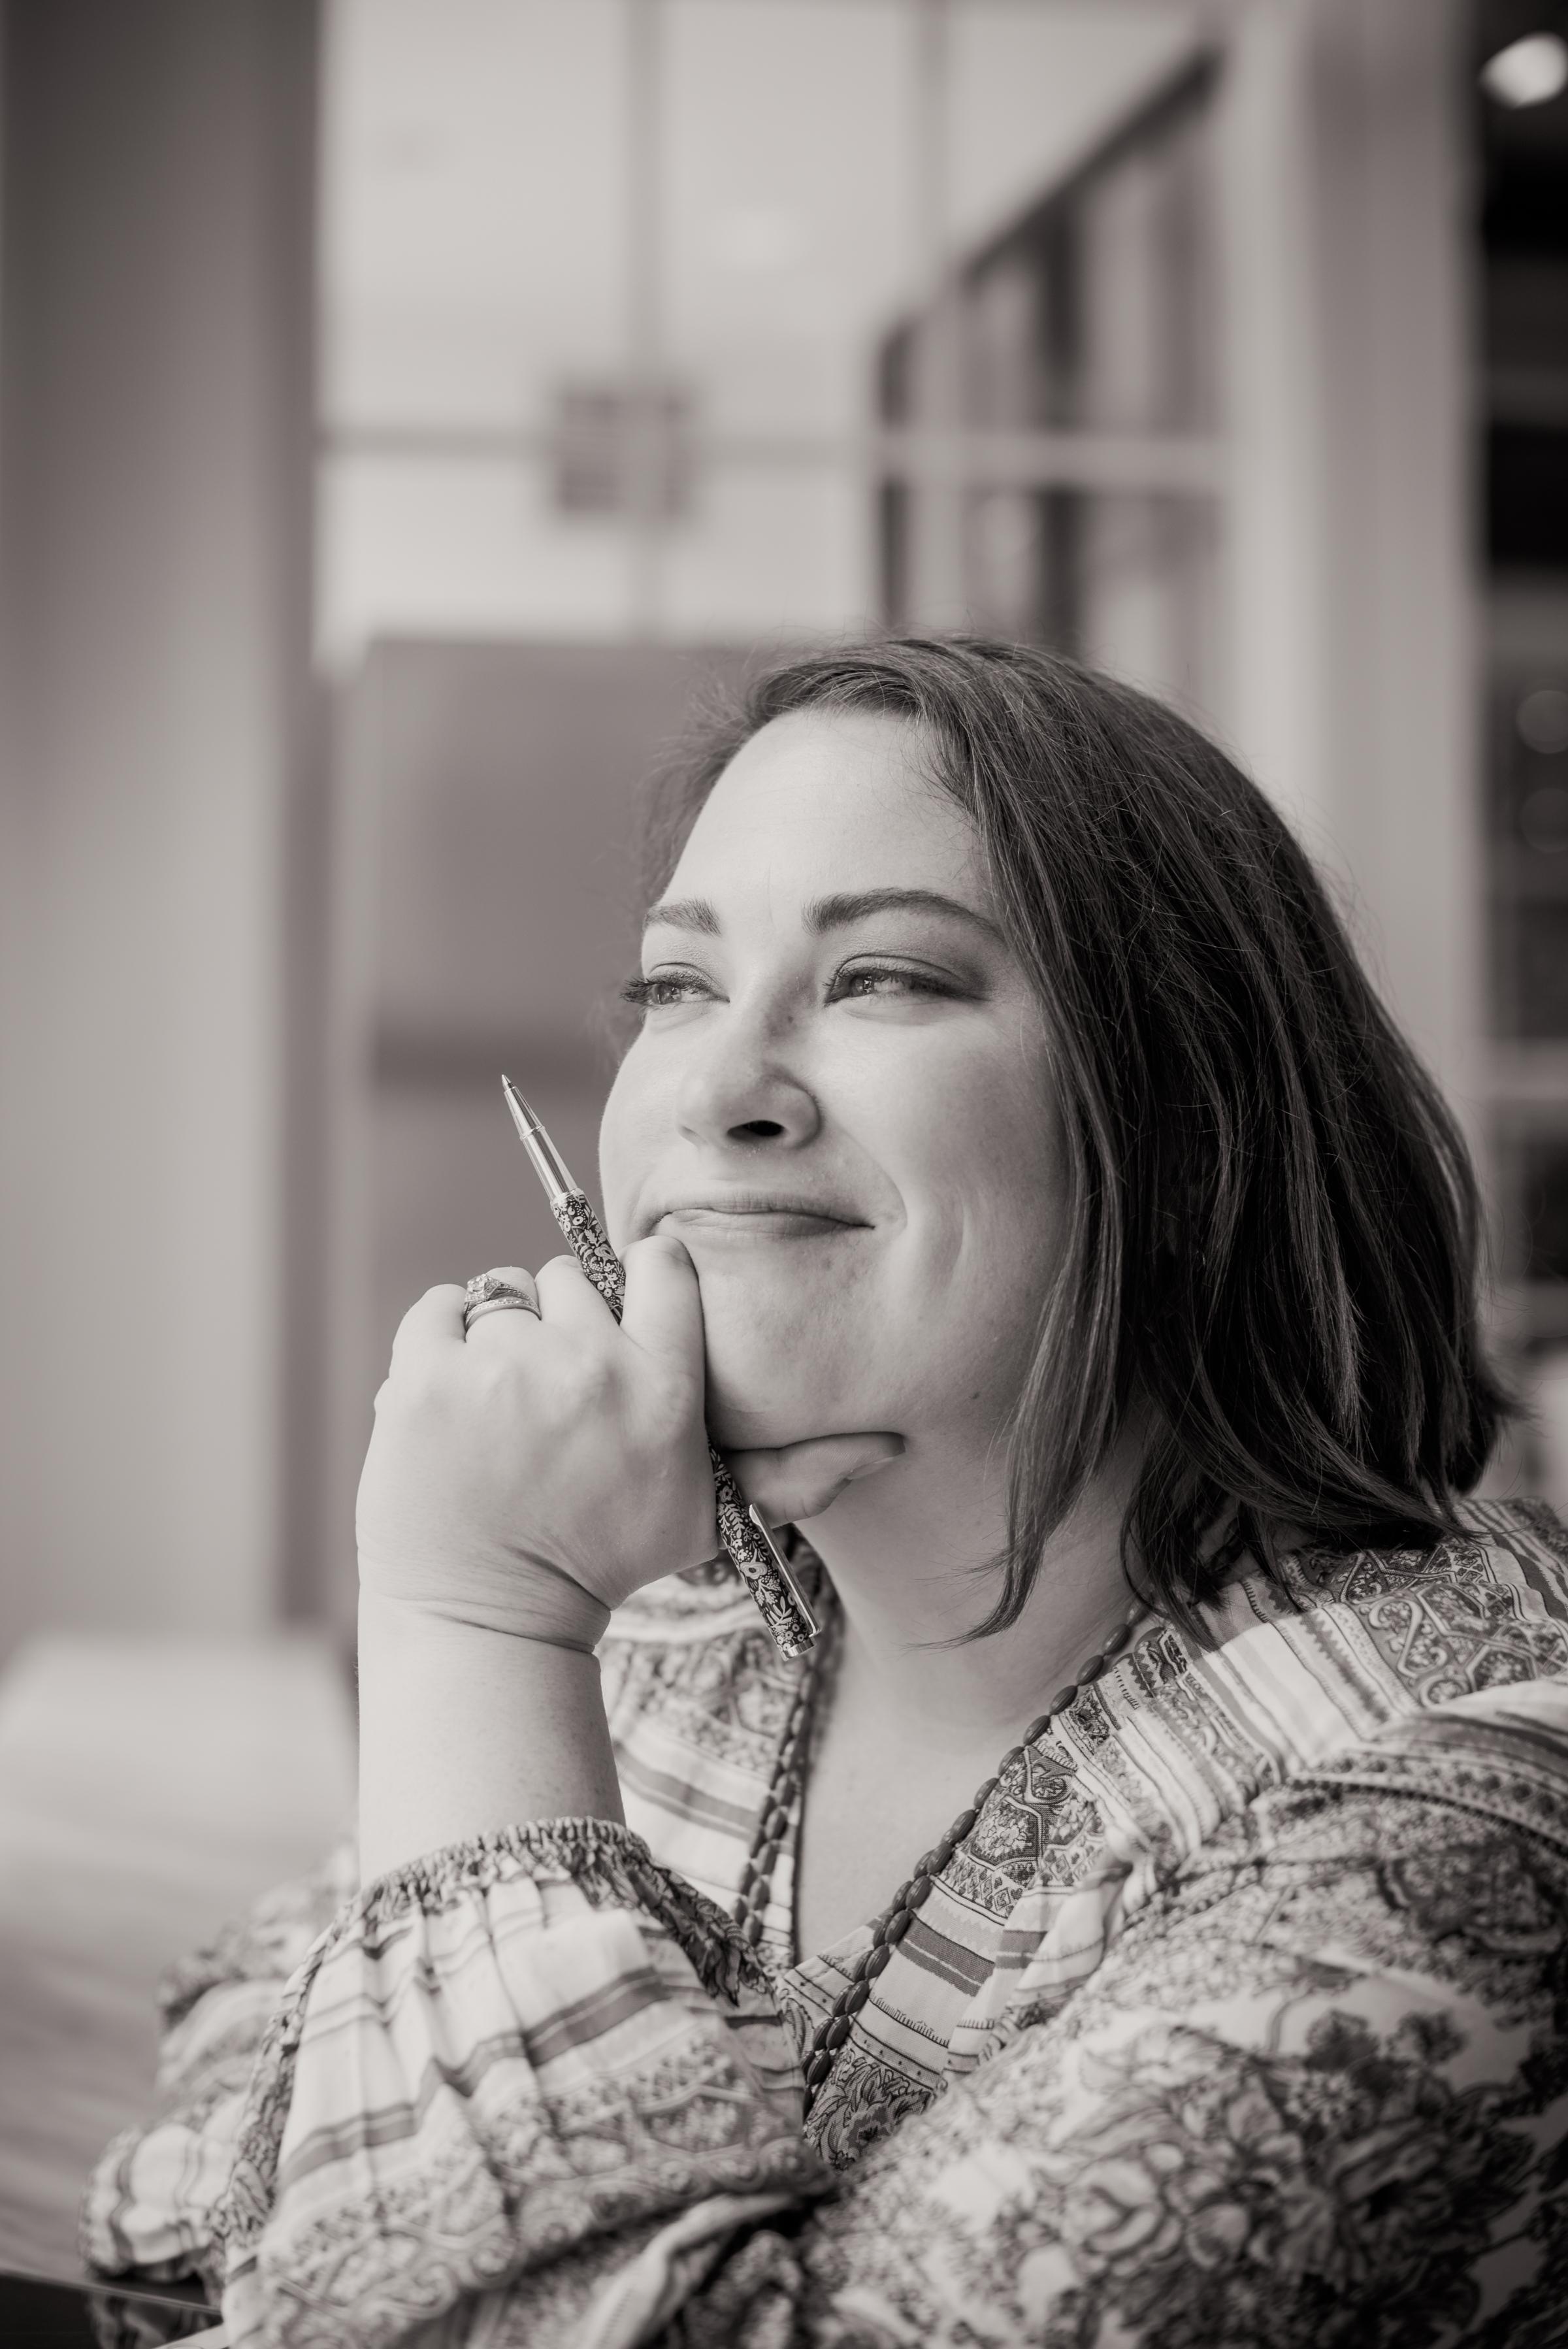 Christine-Dore-Trant-Writer-Editor-Freelance-Founder-Asterism-and-Co-Book-Publishing-Travel-Blog-Writer